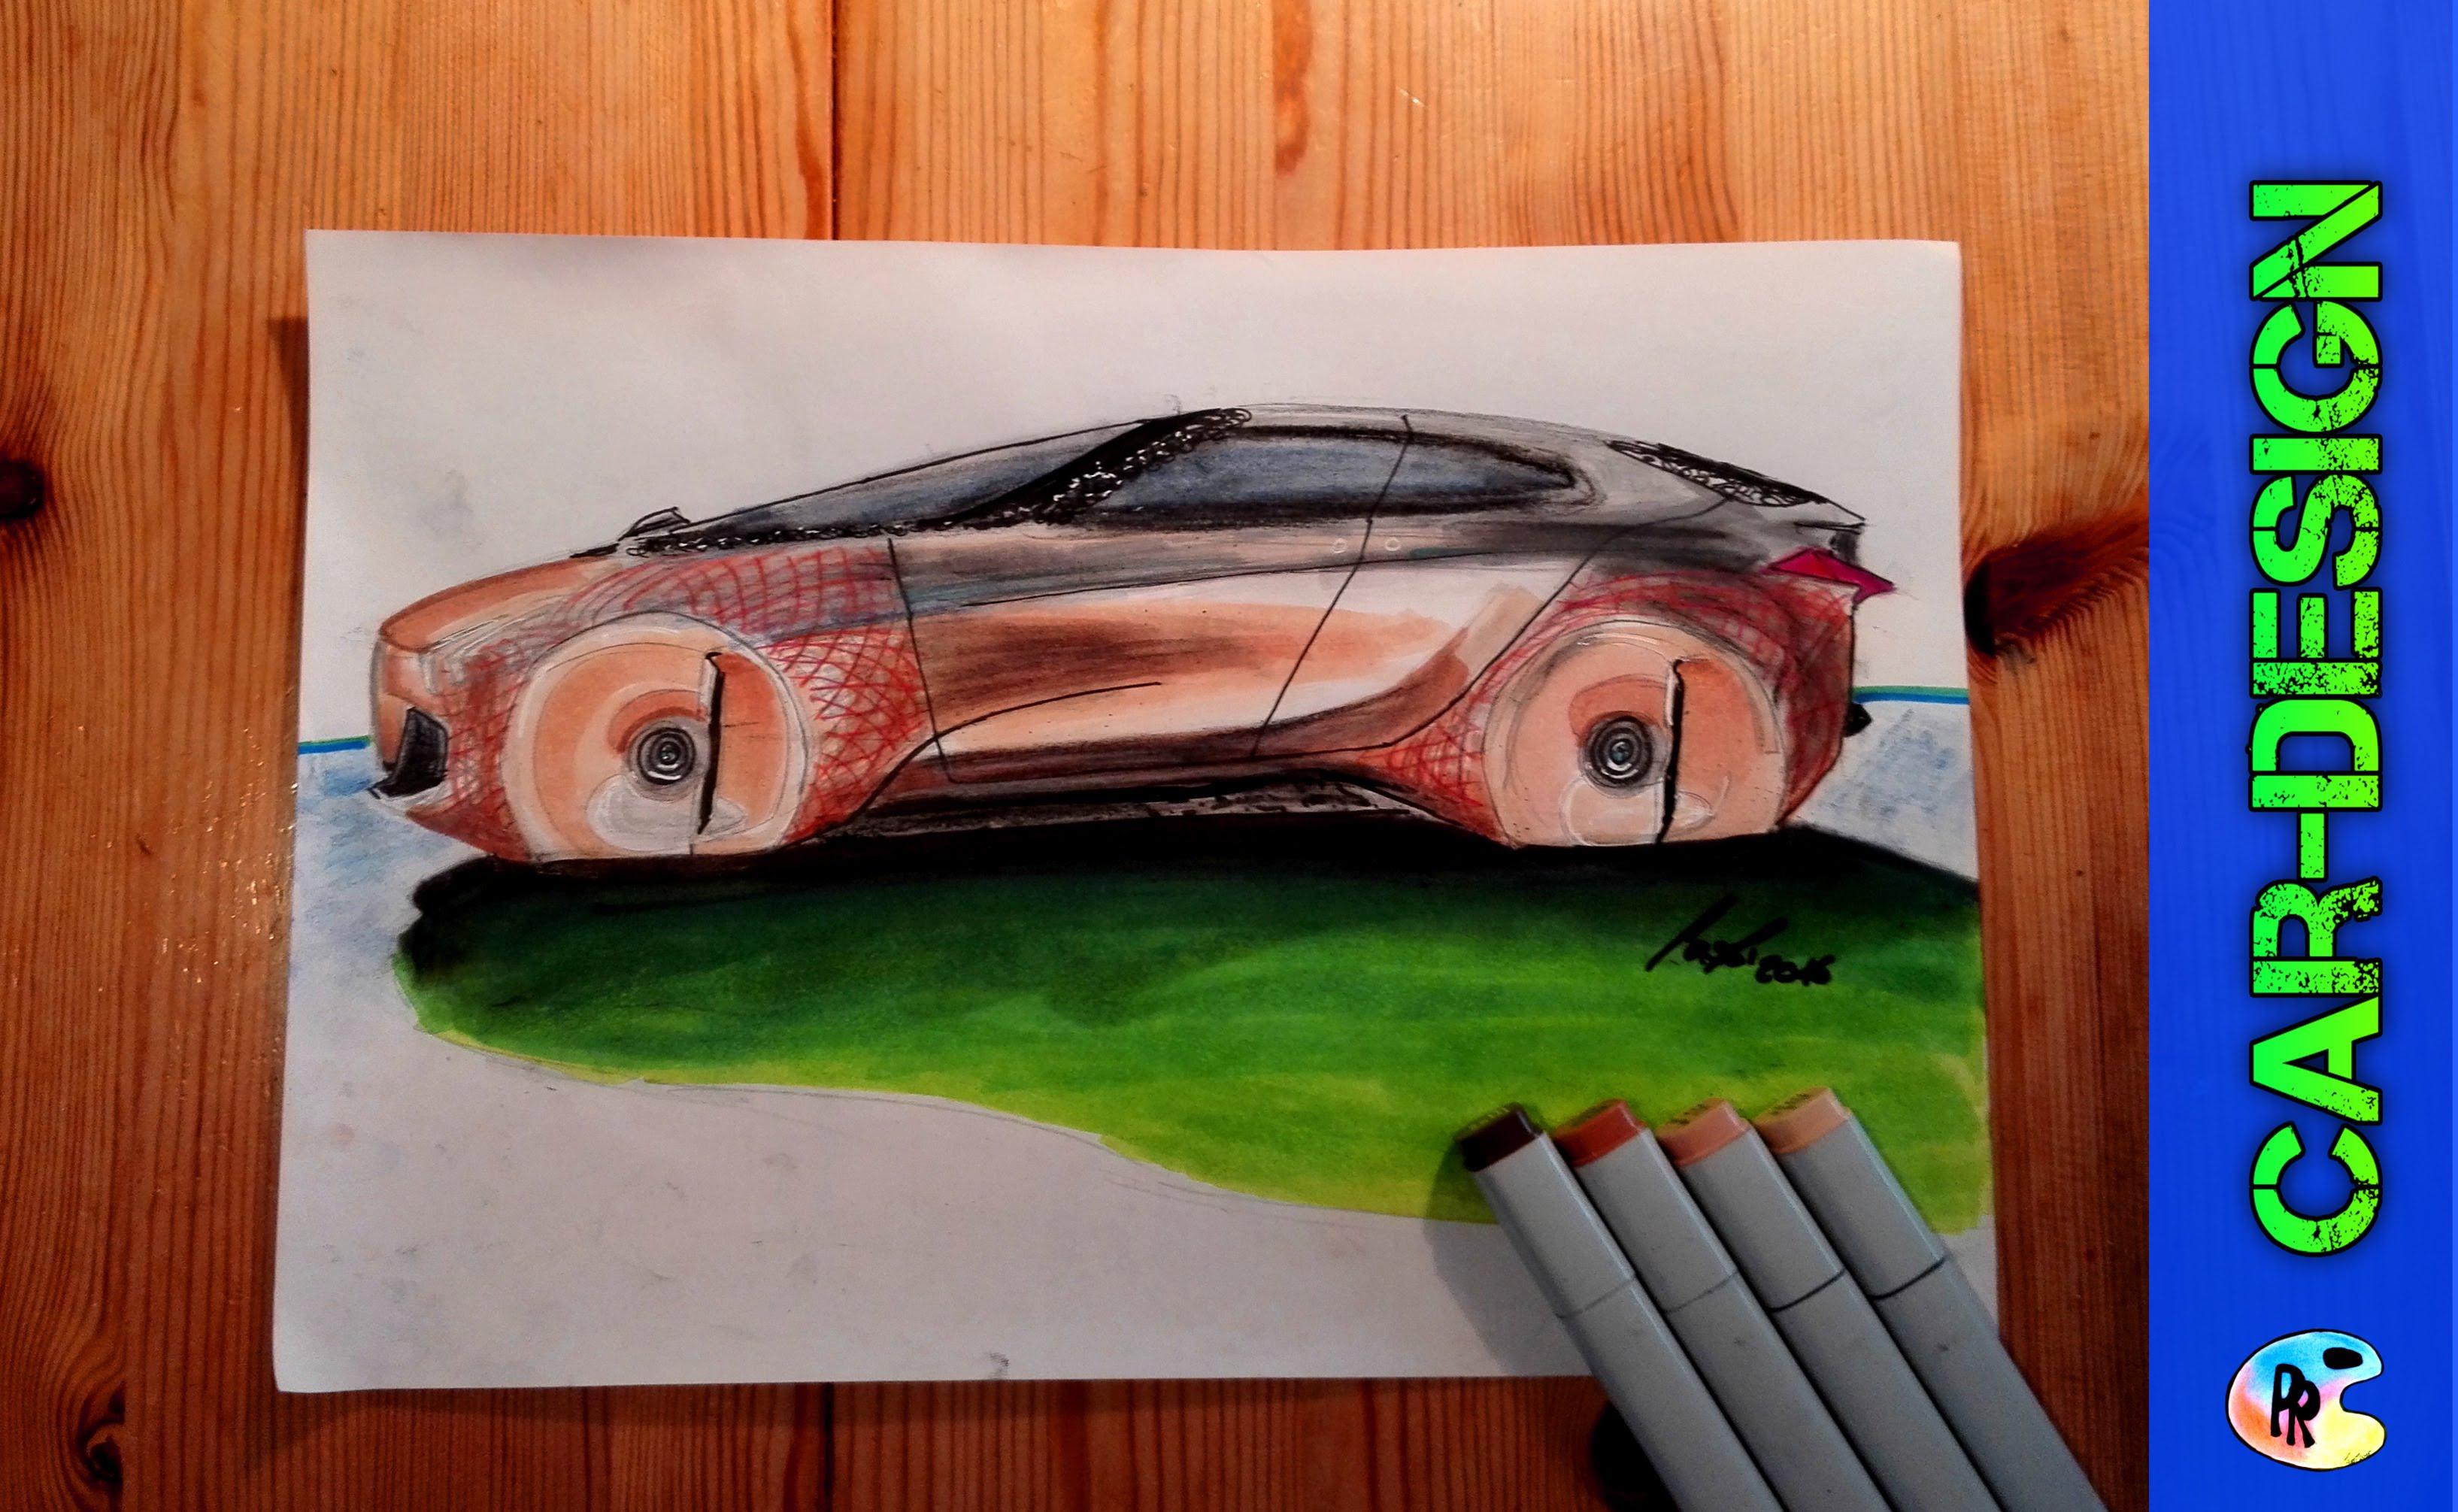 3269x2011 Bmw Next 100 Concept Car Design Speed Drawing Bmw Next 100